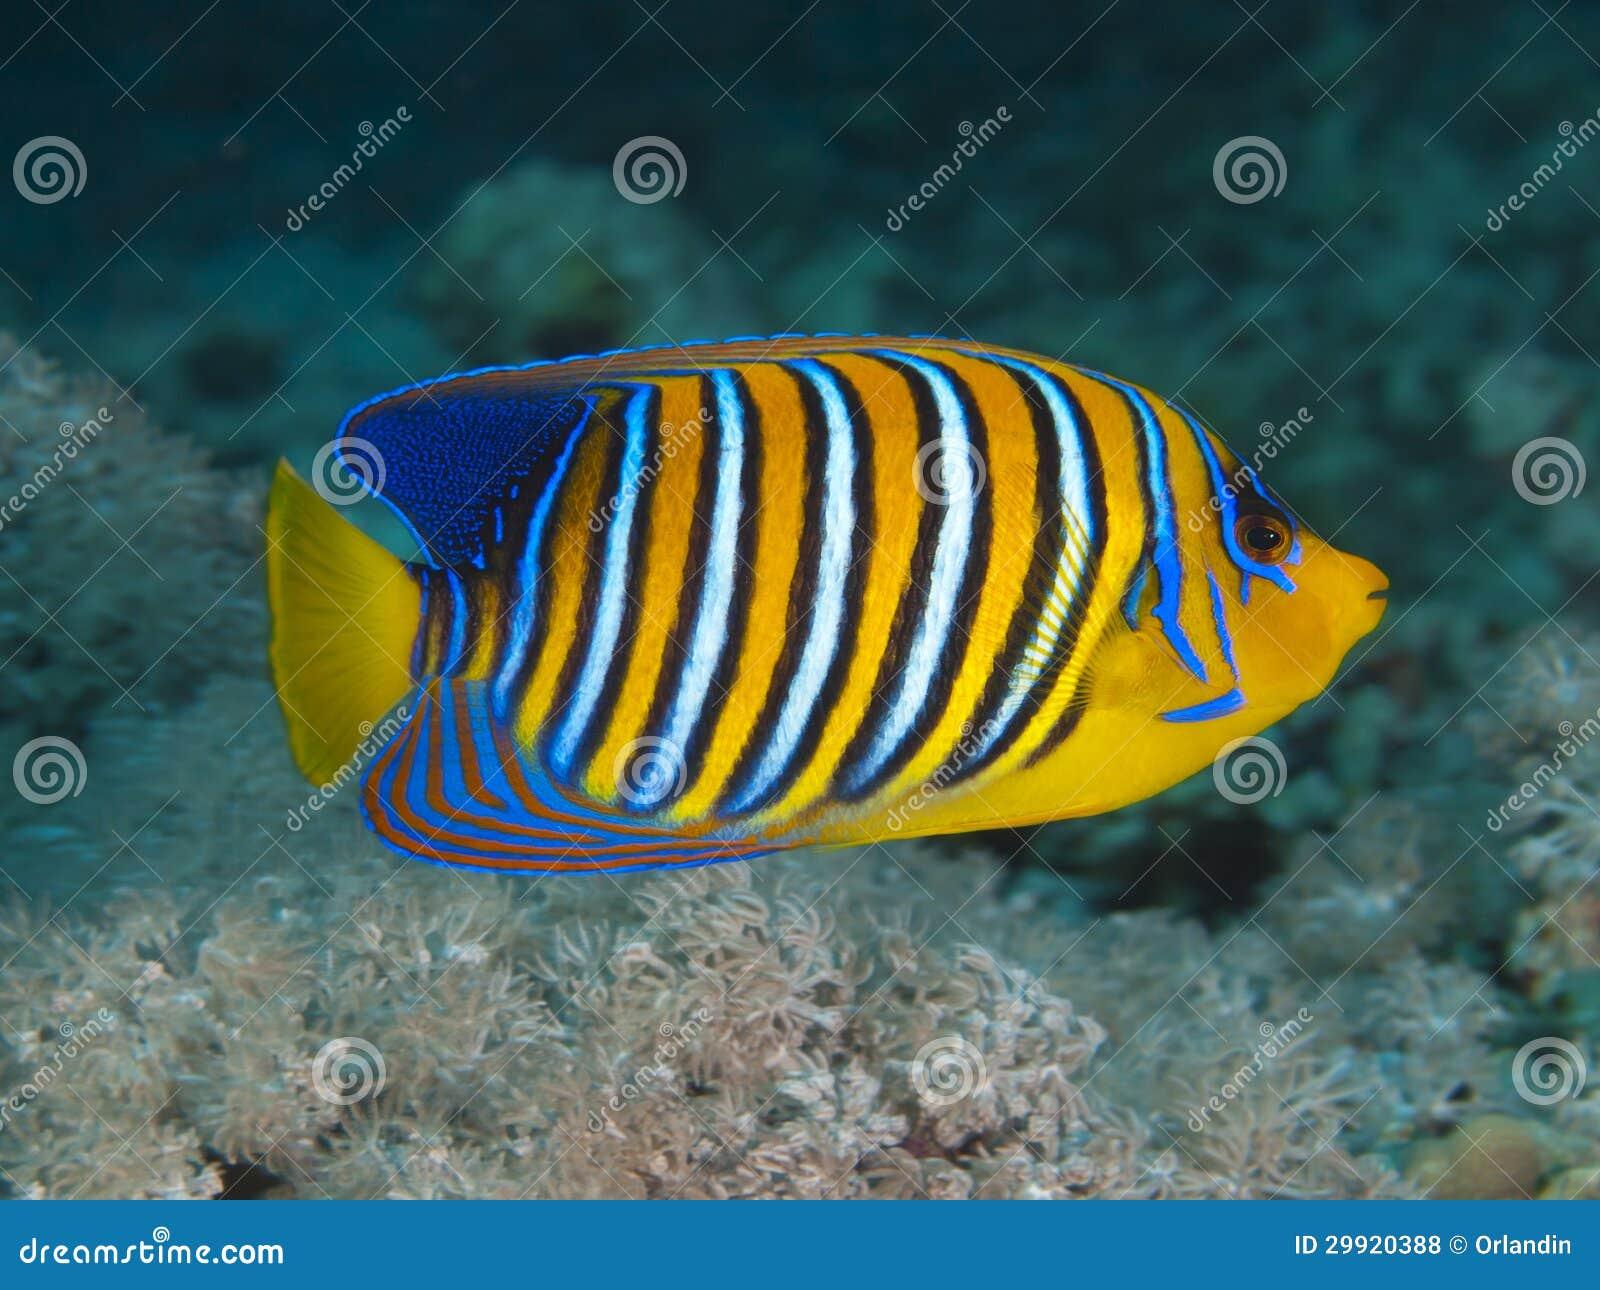 Regal Angelfish Regal angelfish in red sea. mr: no; pr: no